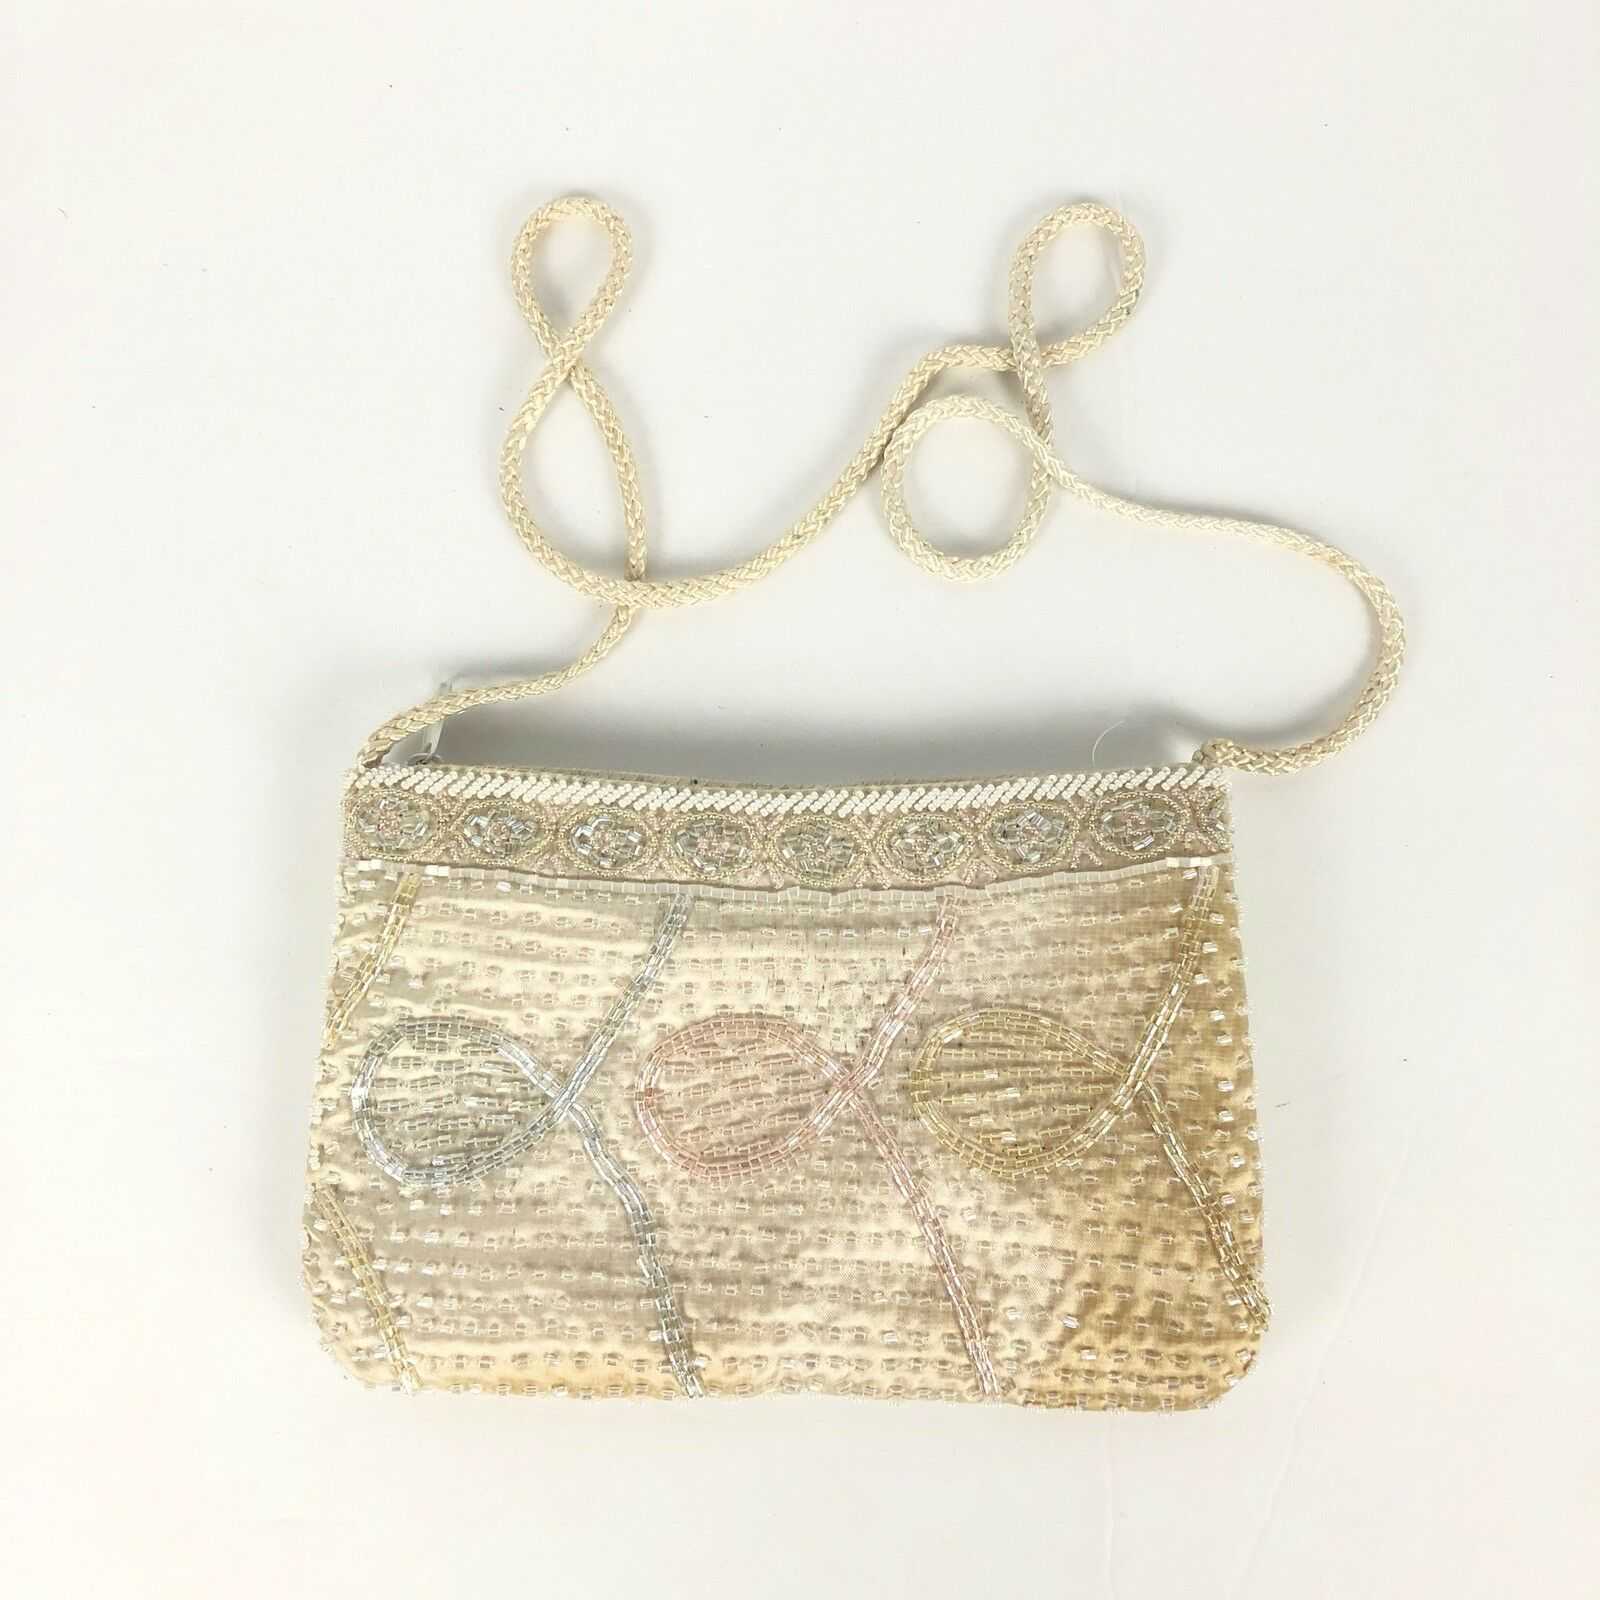 @ Vtg Magid Womens Evening Bag Purse Handbag Shoulder Small Beaded Embelished BC